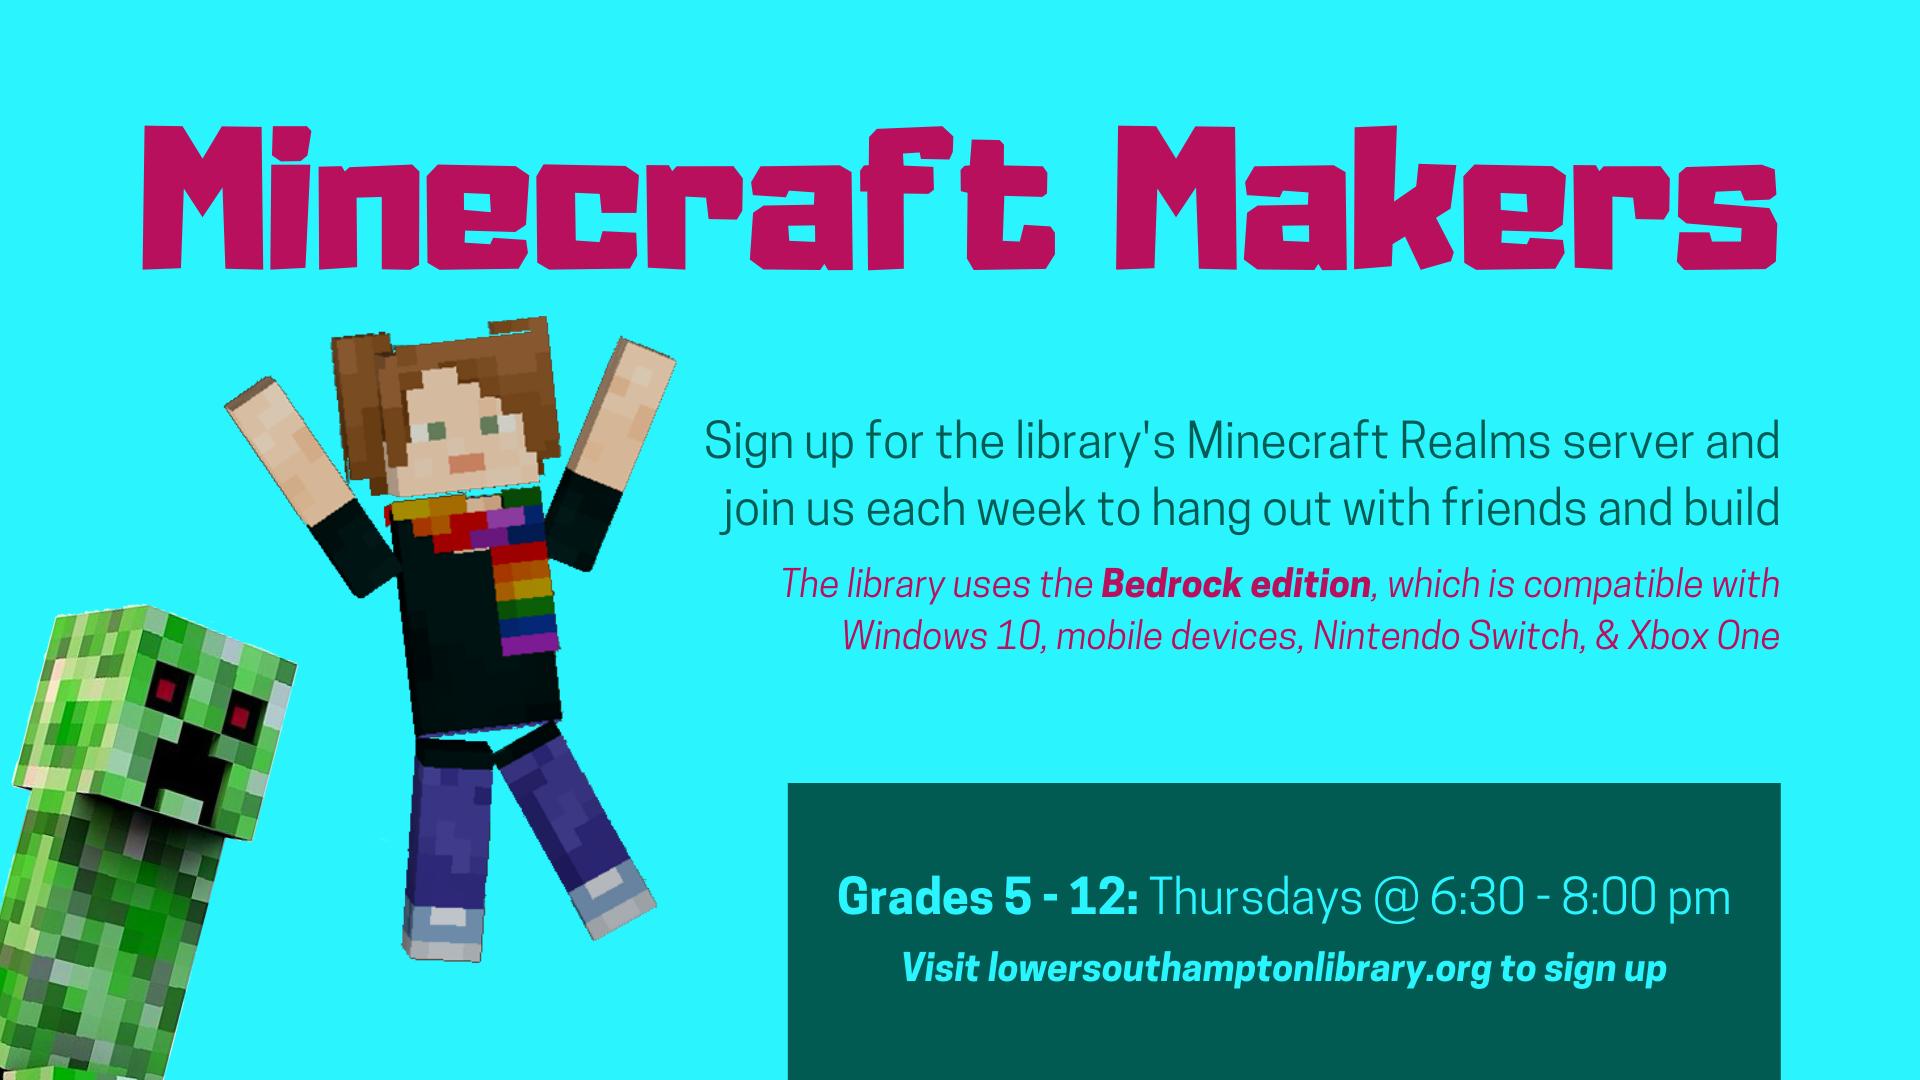 Minecraft Makers | Grades 5 - 12